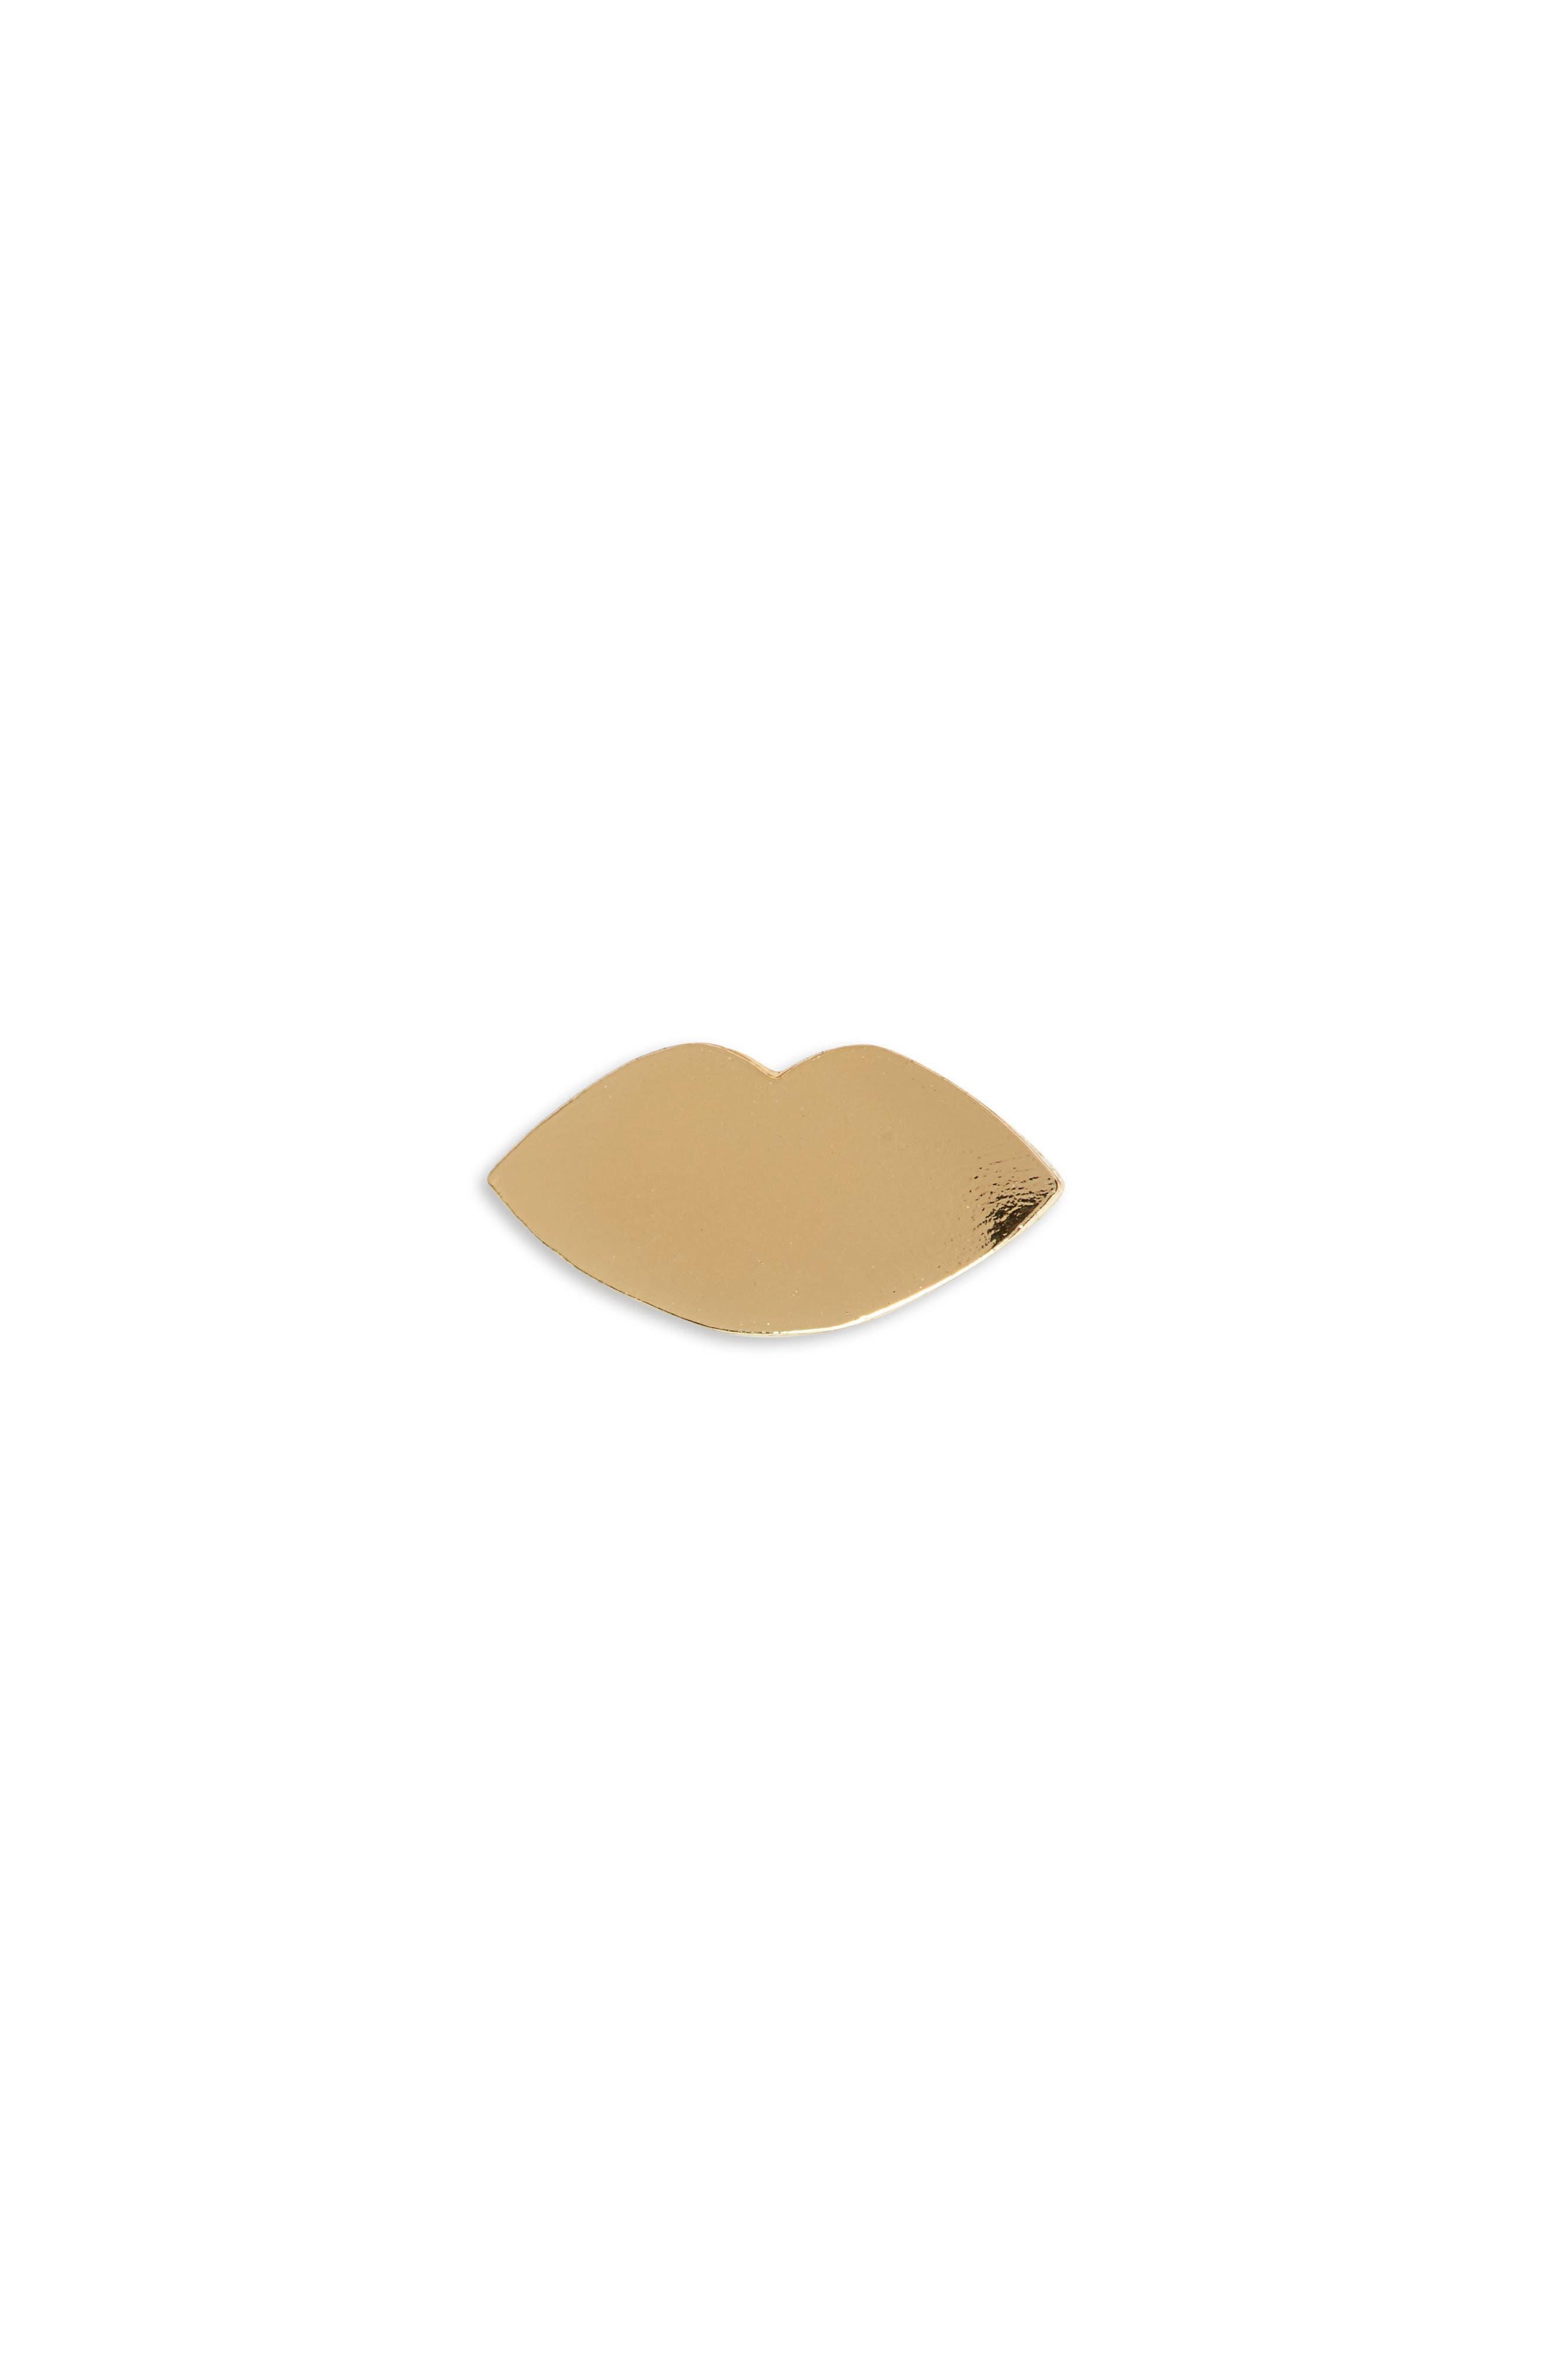 Tiny Lips Single Stud Earring